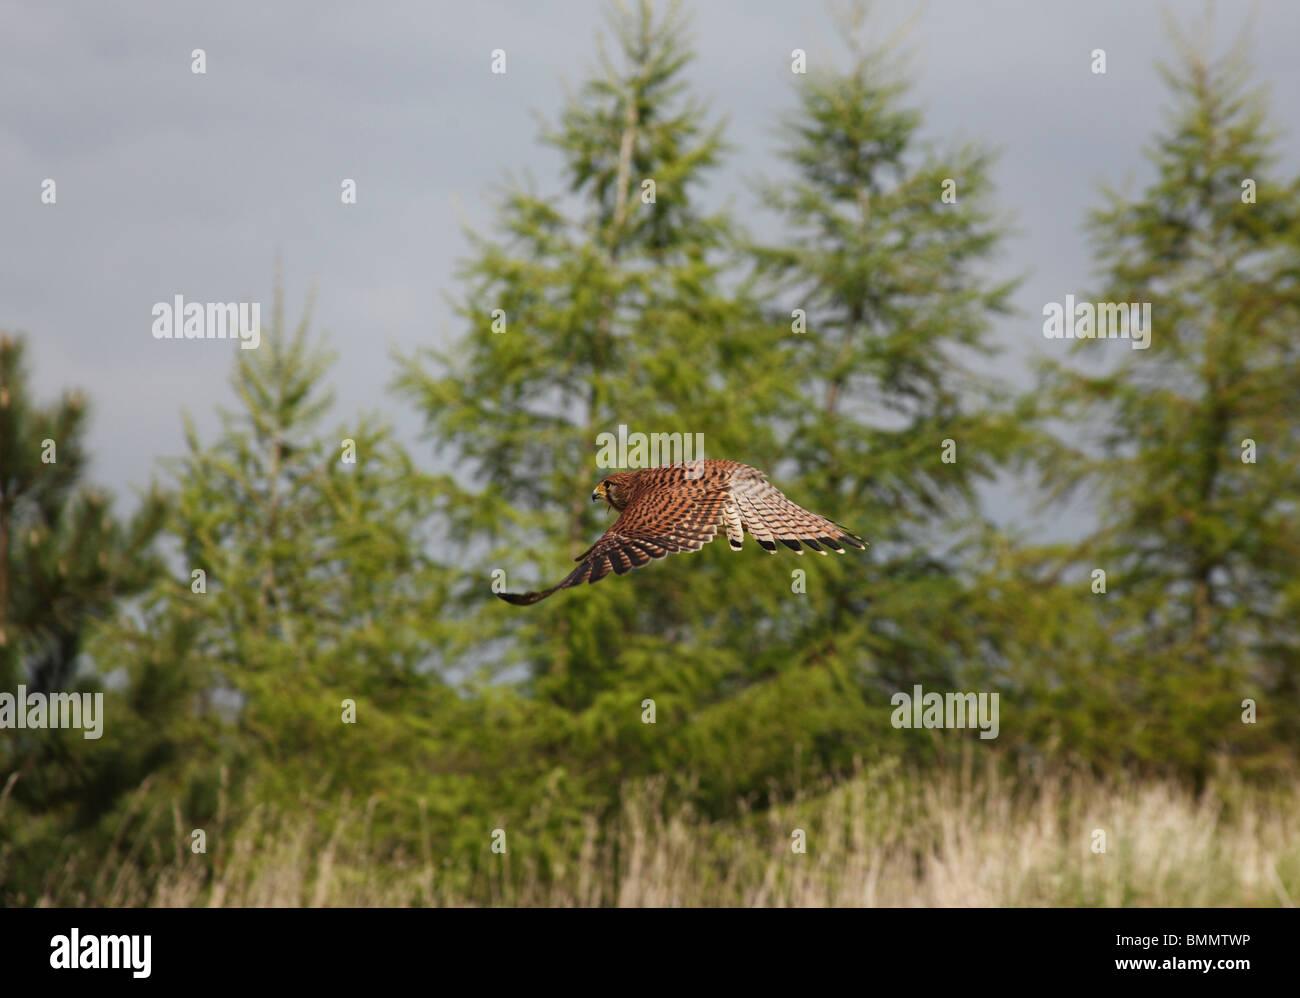 Kestrel (Falco tinnunculus) female in flight side view - Stock Image